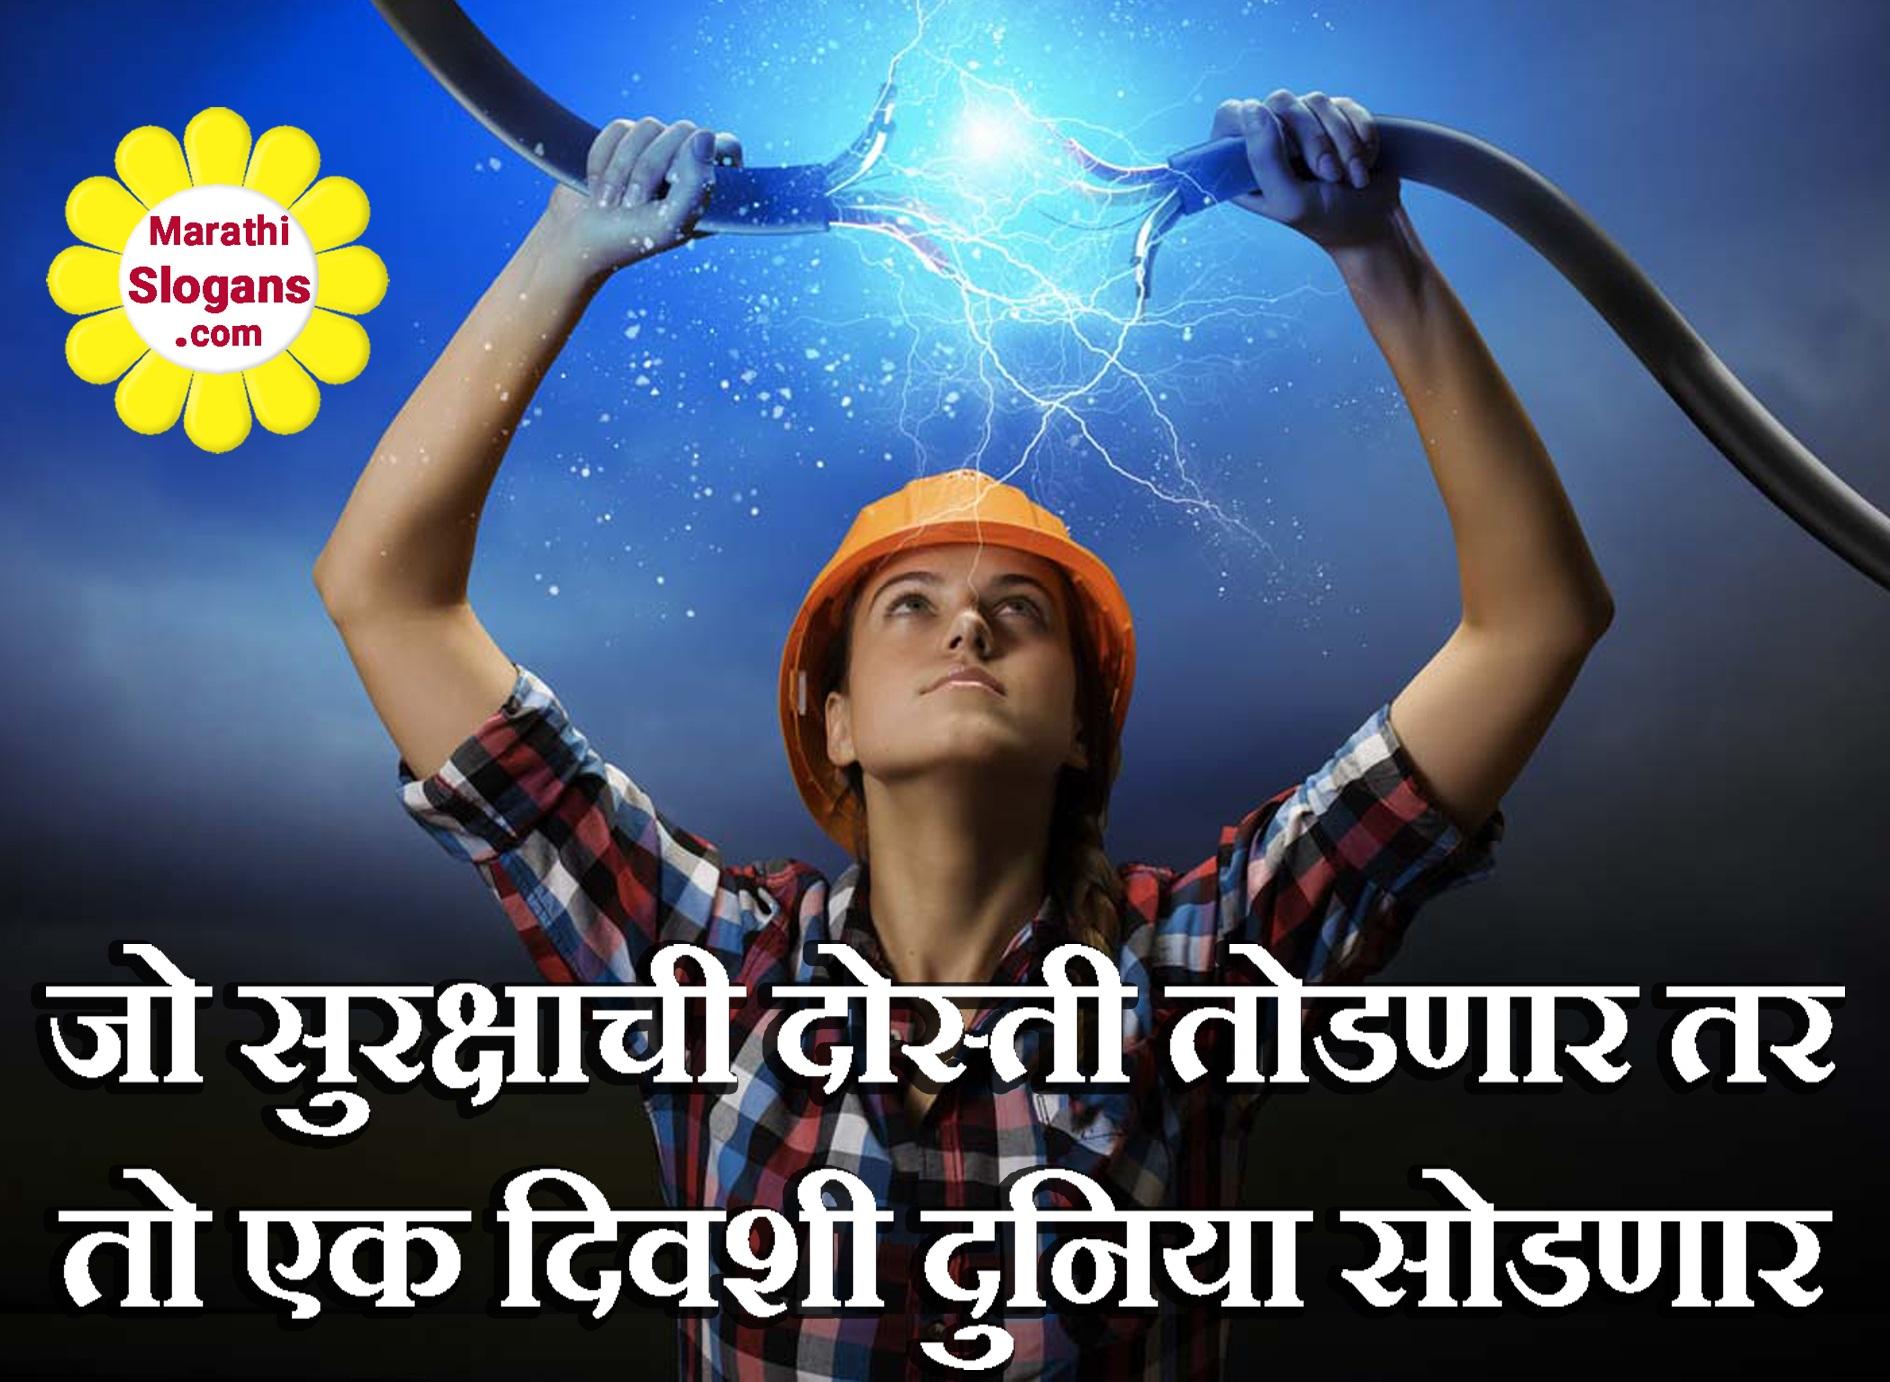 marathi slogans new fashions